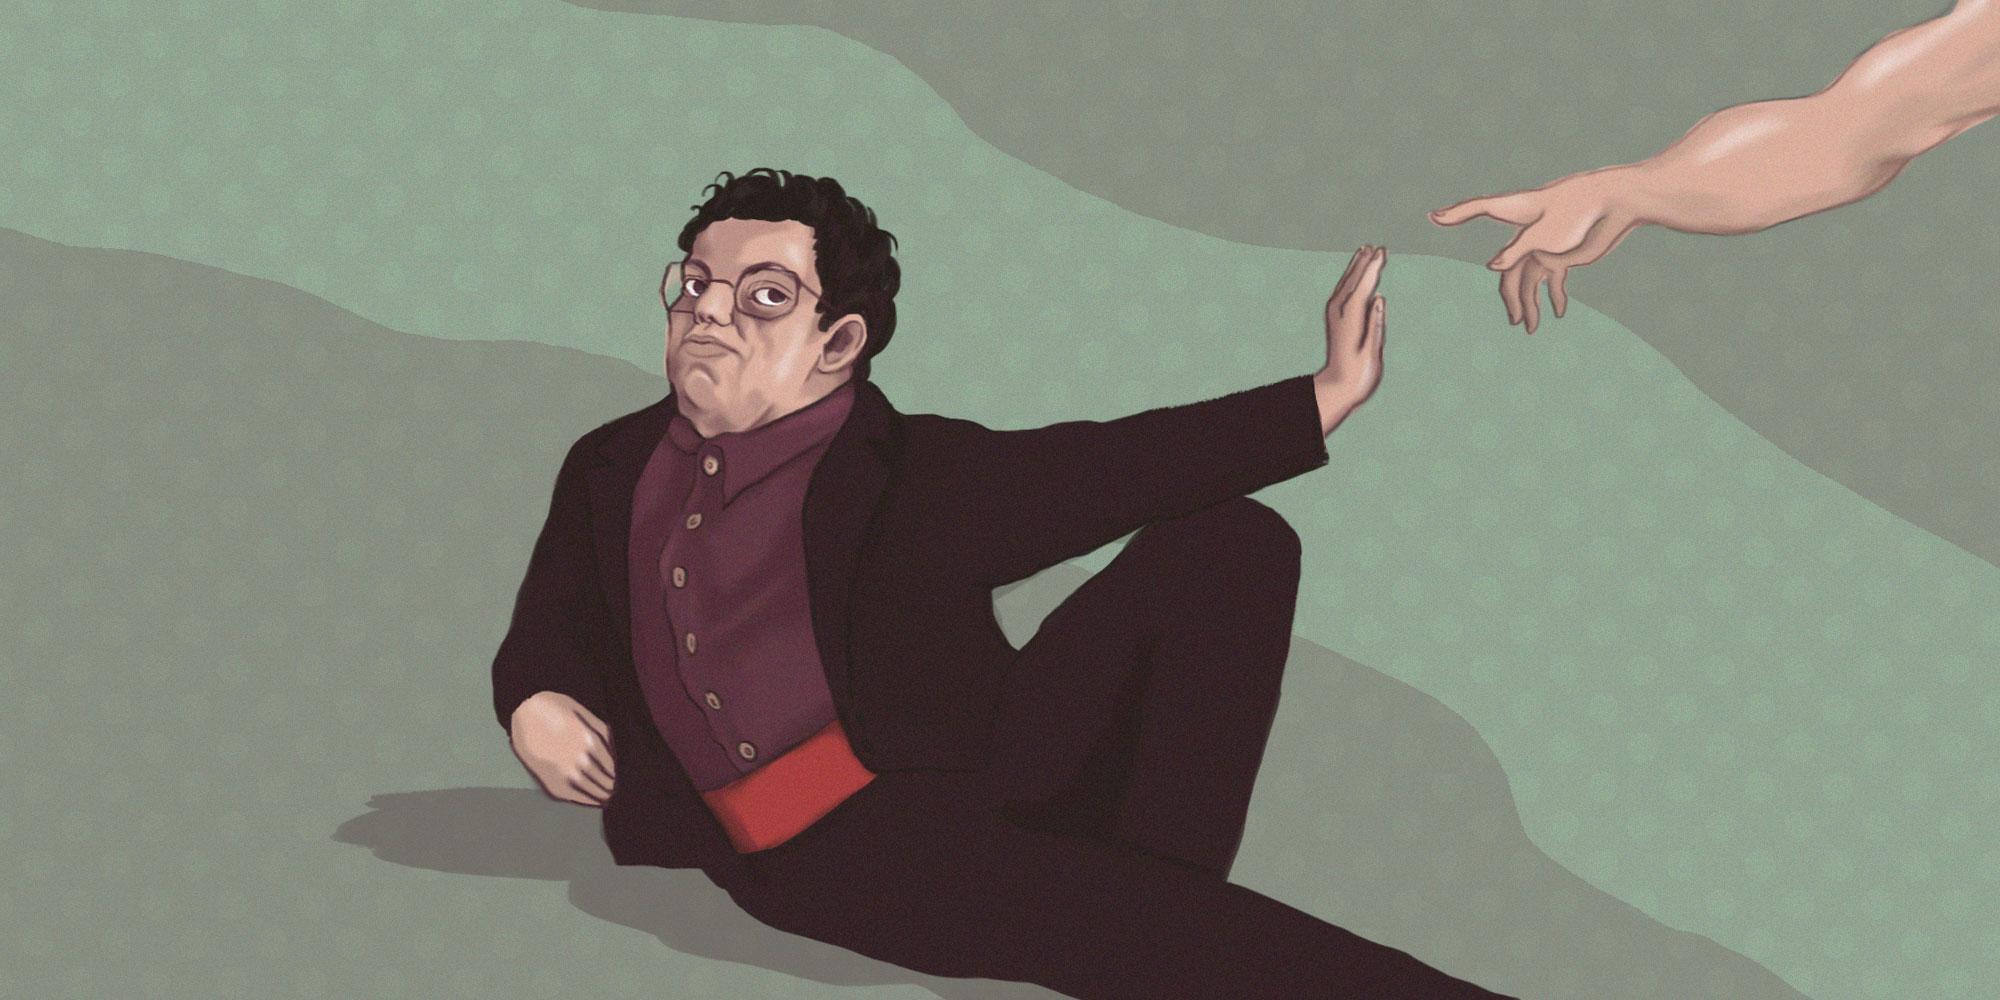 diego-rivera-ateo-ateismo-mexico-mexicano